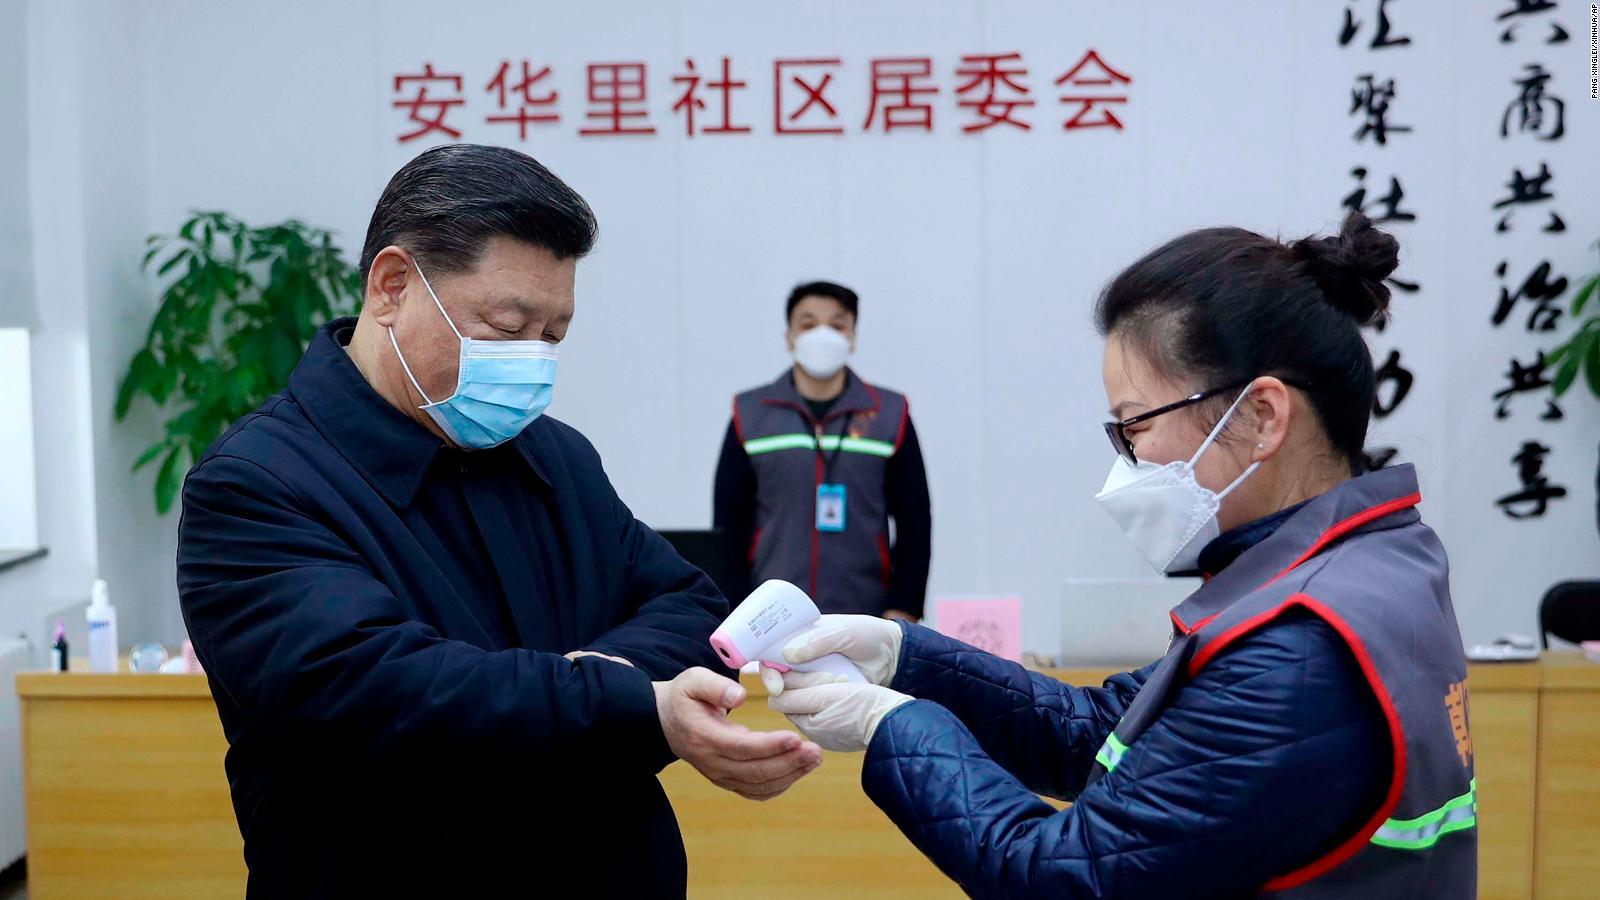 Chinese President Xi Jinping visits a coronavirus testing center in Beijing.